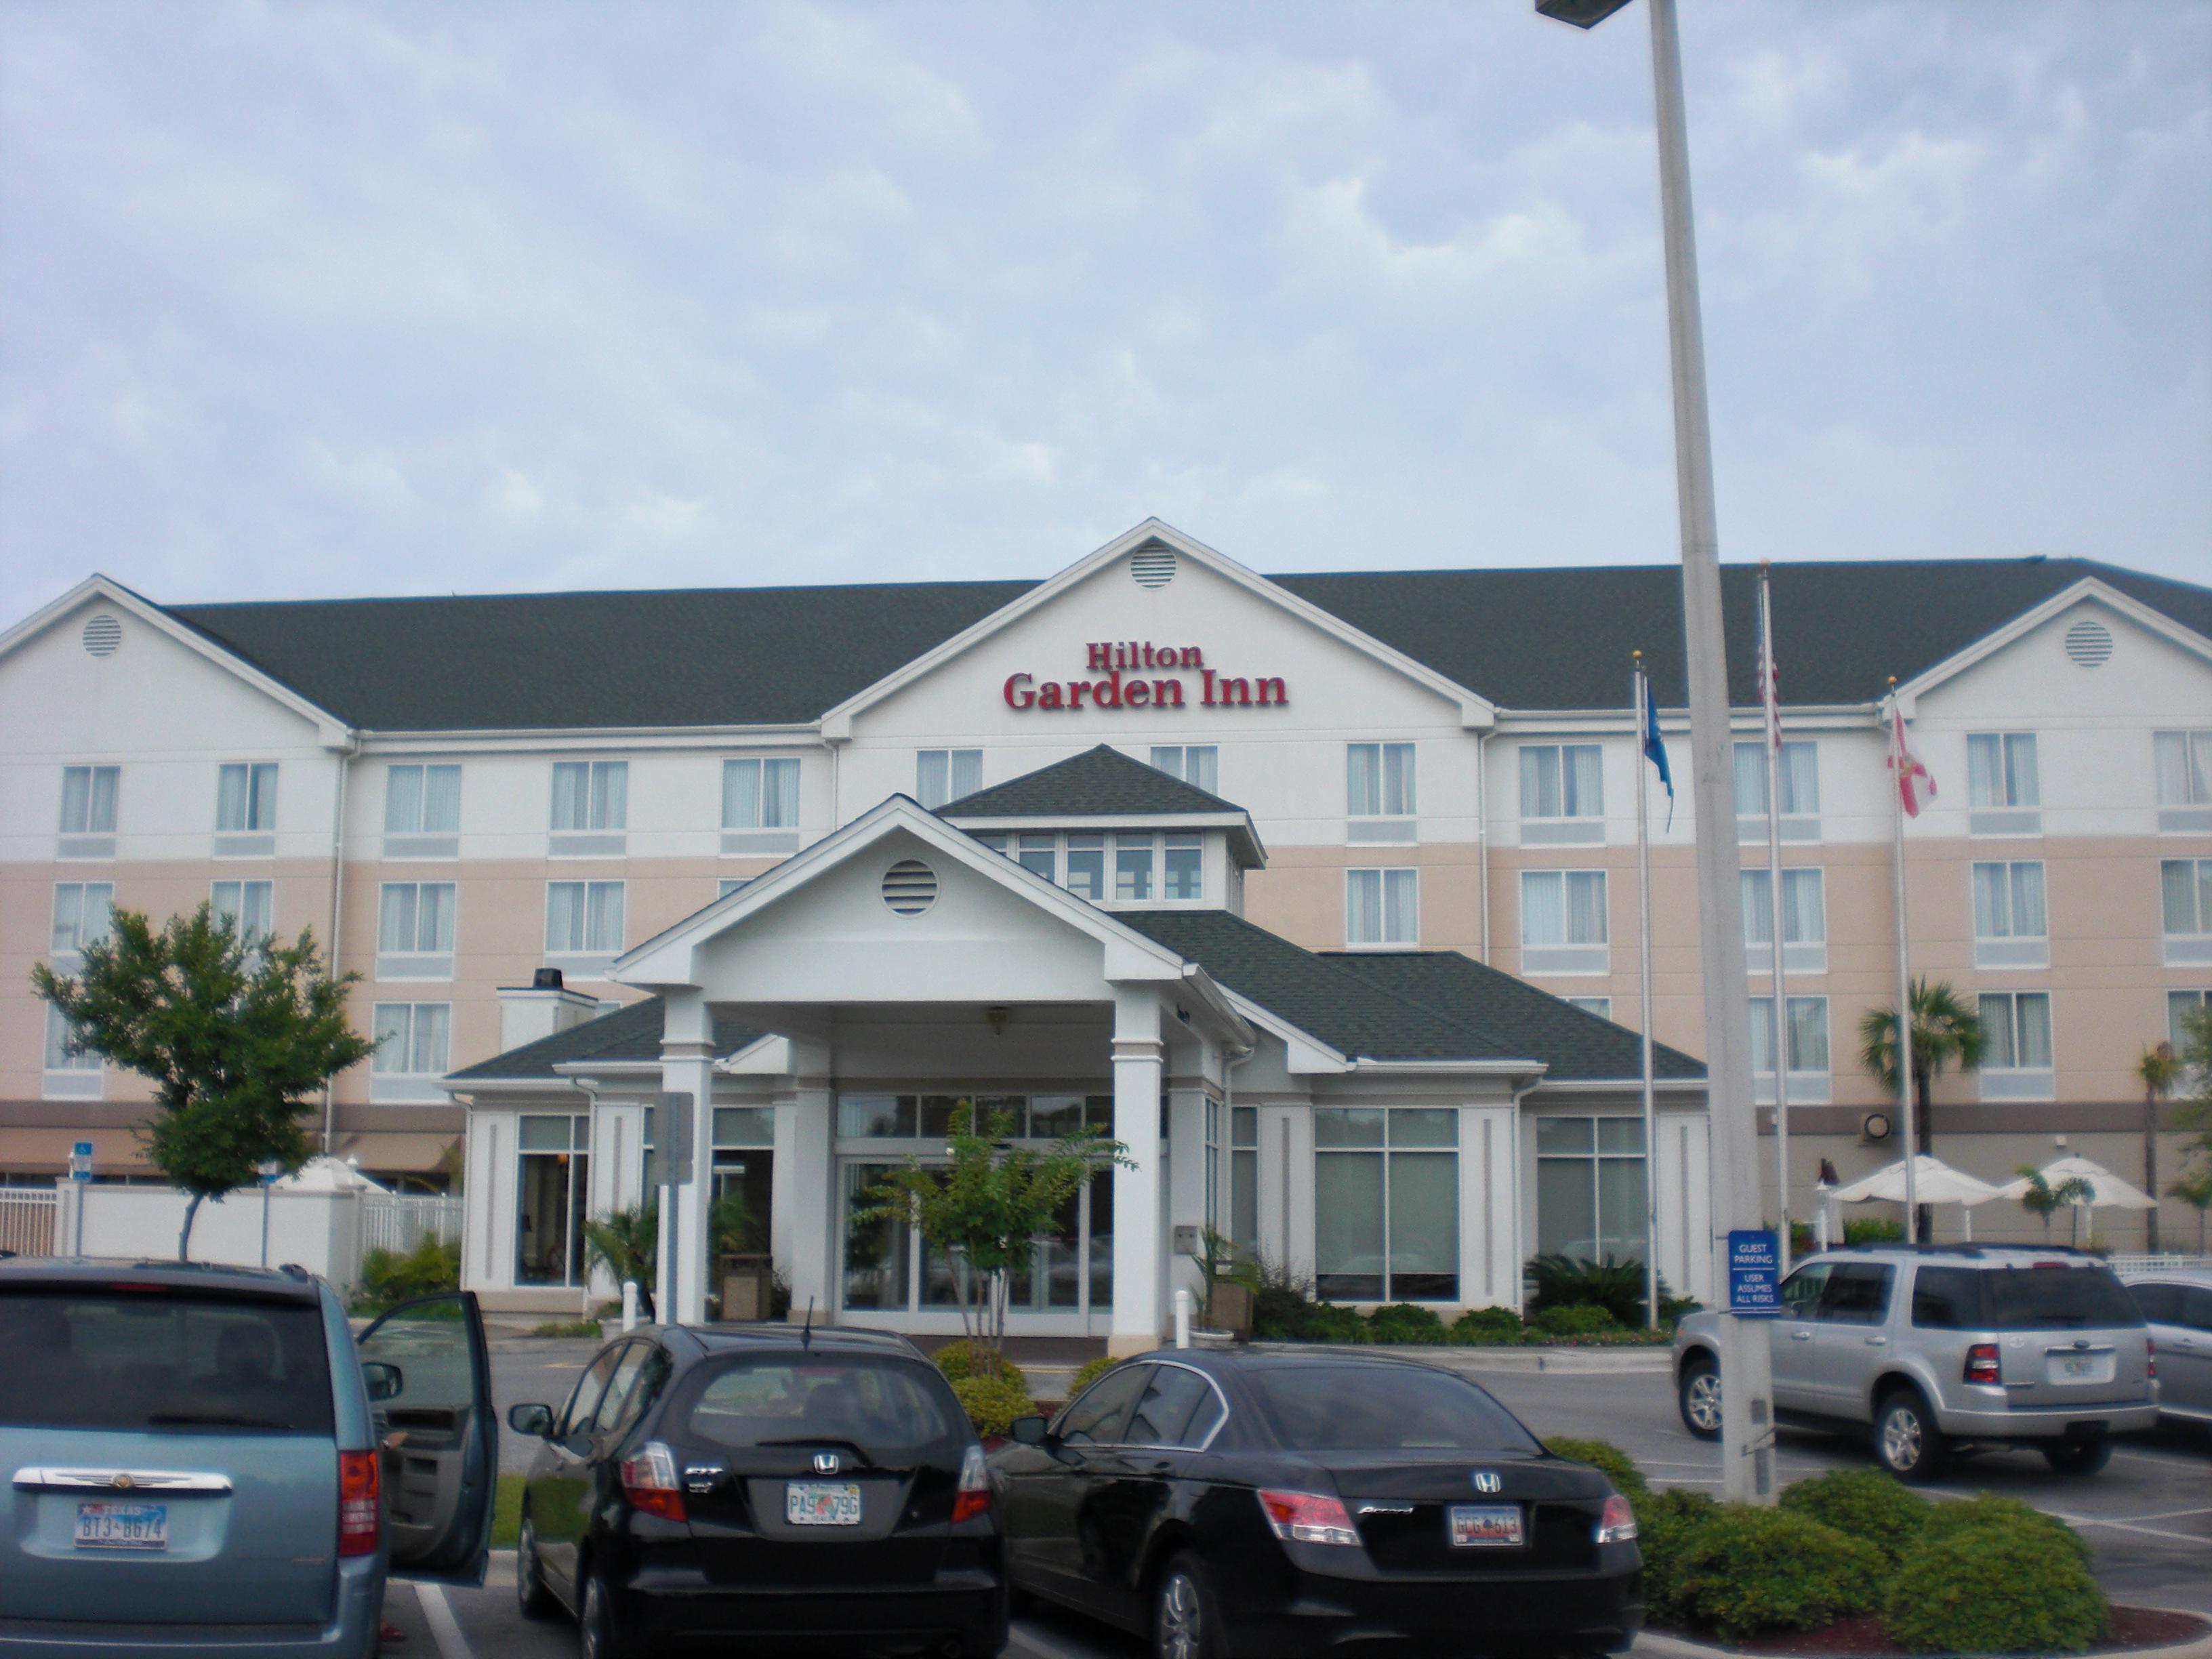 Hilton Garden Inn Arlington Va Bed Bugs